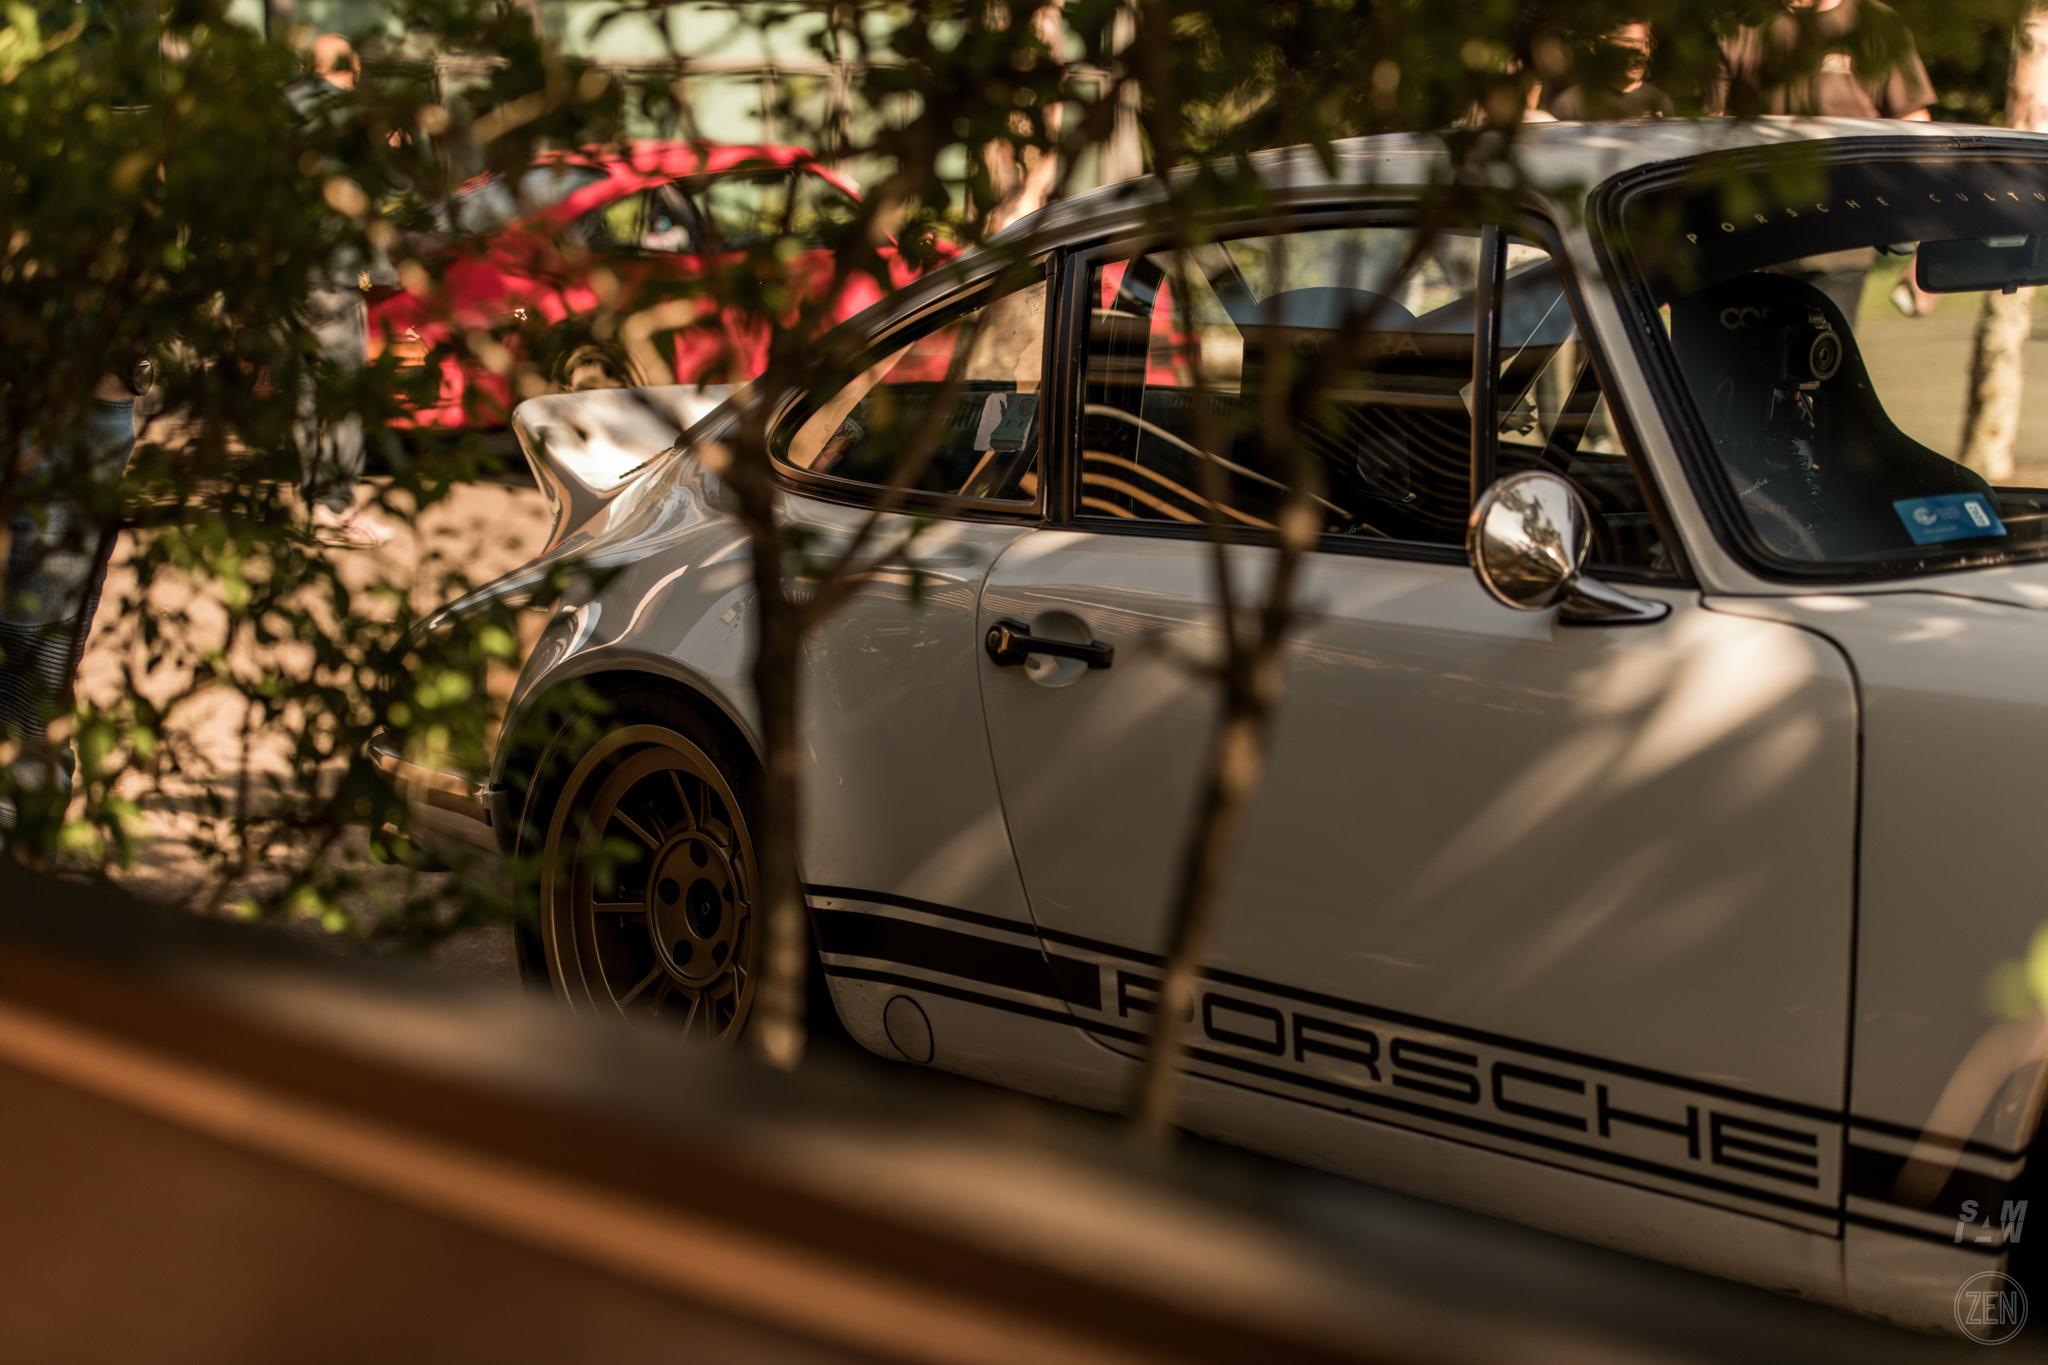 2019-10-27 - Autohaus Porsches & Coffee 153